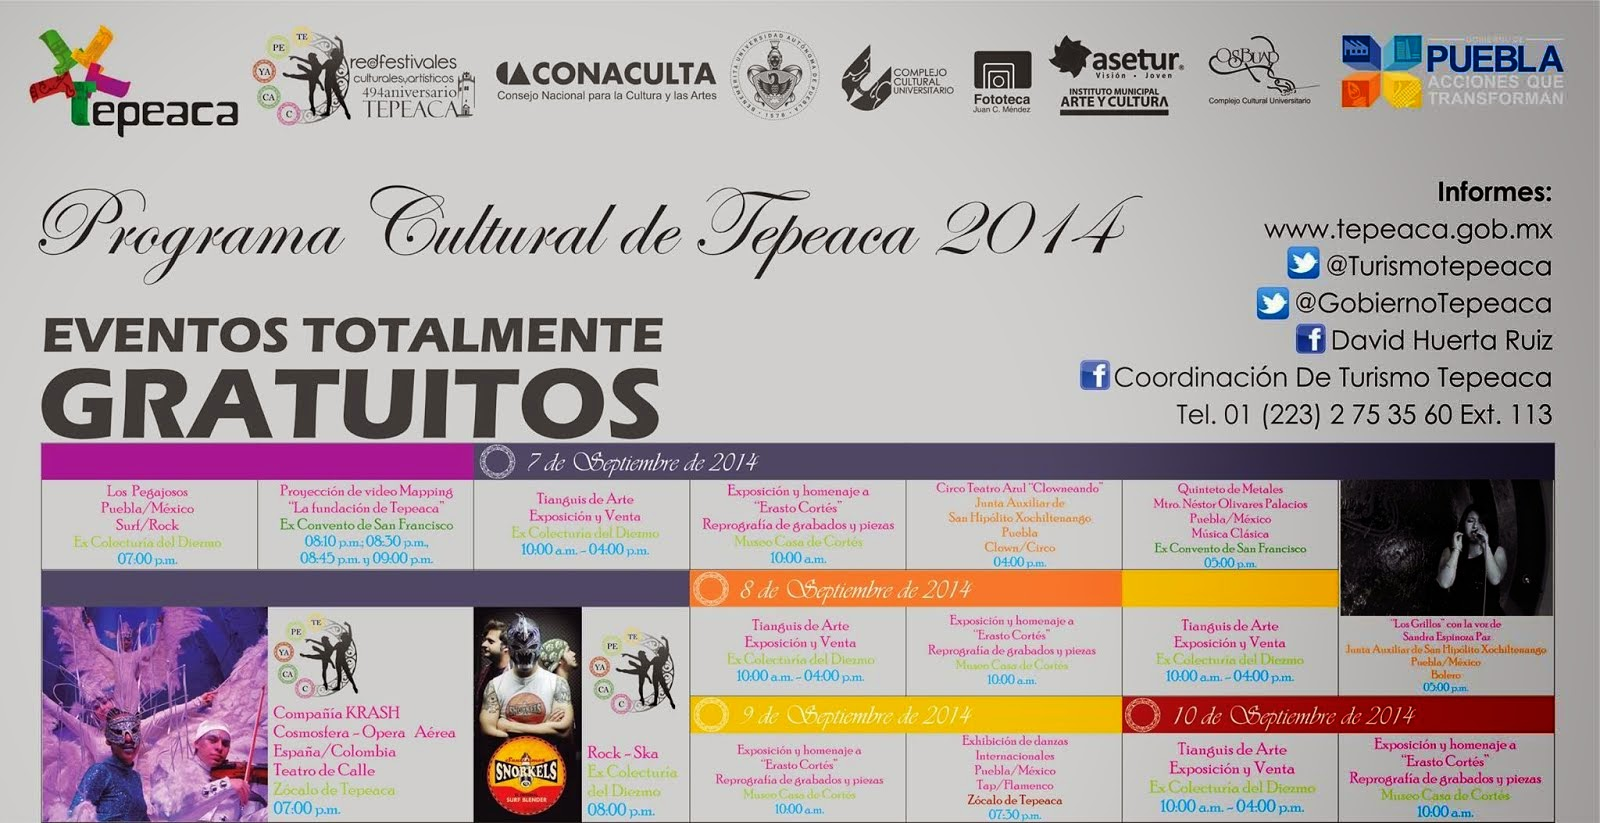 PROGRAMA CULTURAL DE TEPEACA 2014